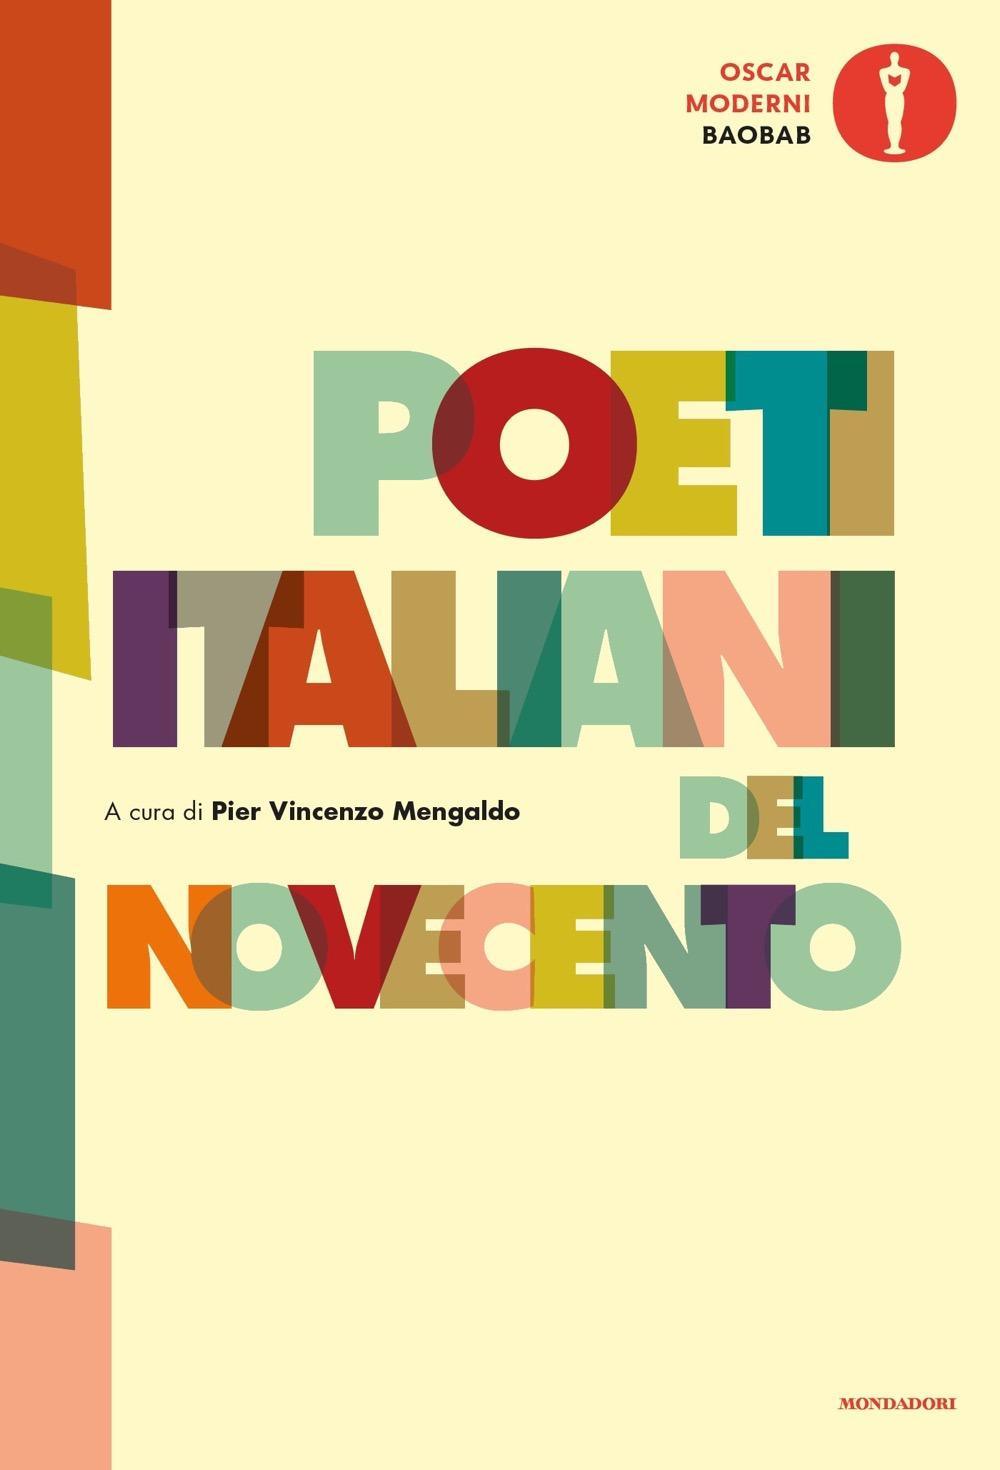 Image of Poeti italiani del Novecento